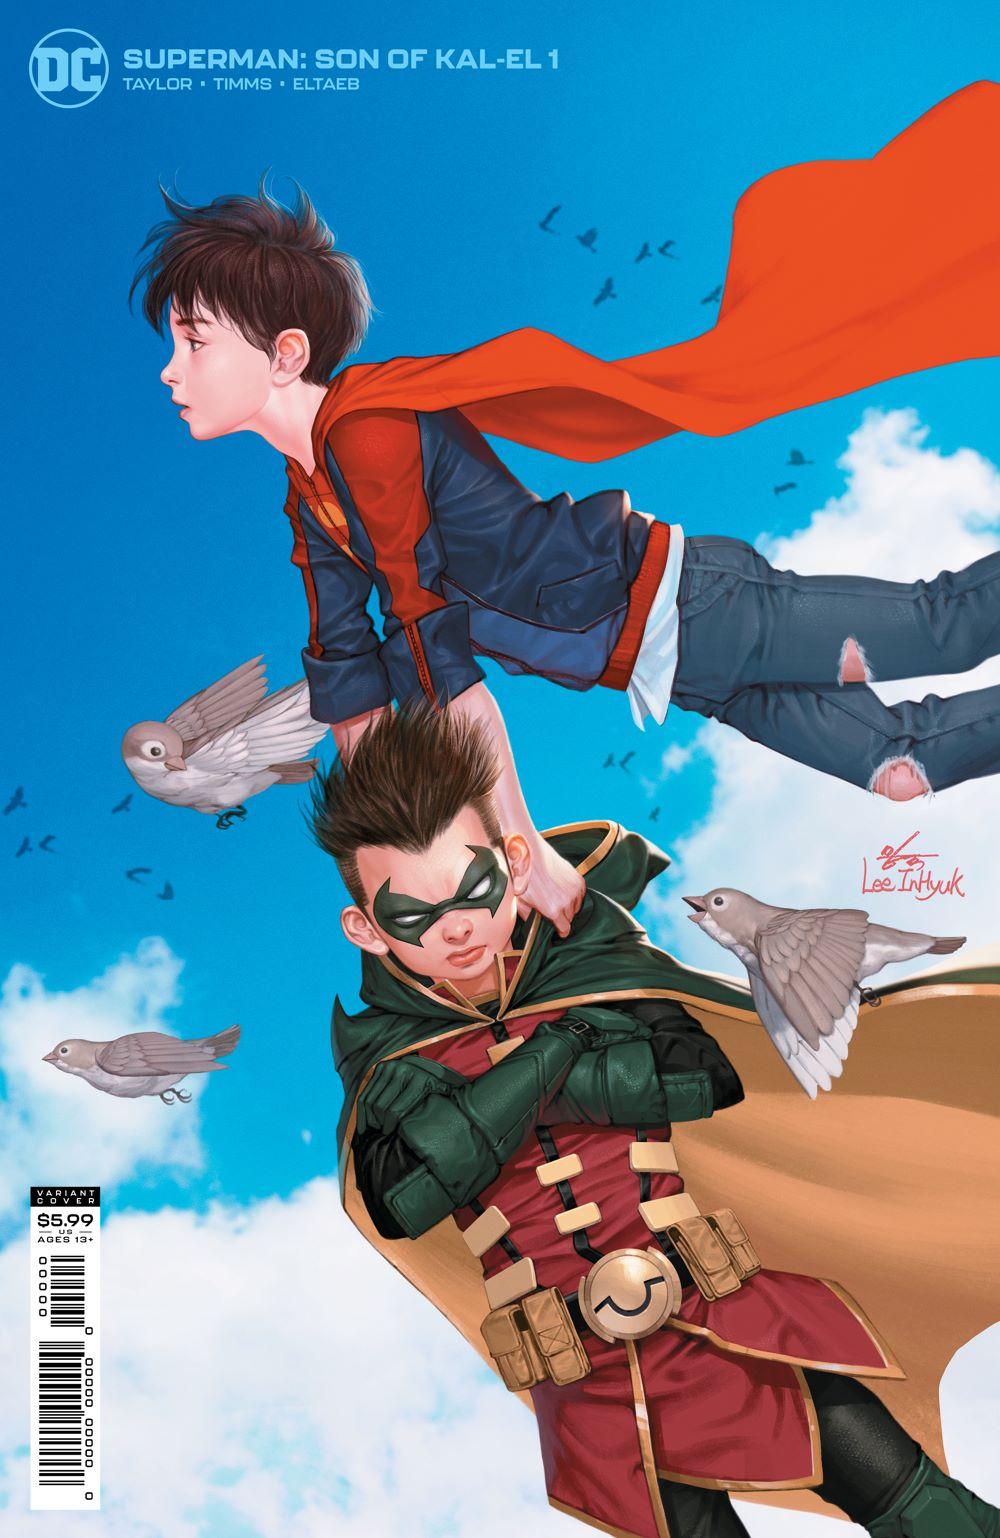 SMSOKE_Cv1_var1 DC Comics July 2021 Solicitations